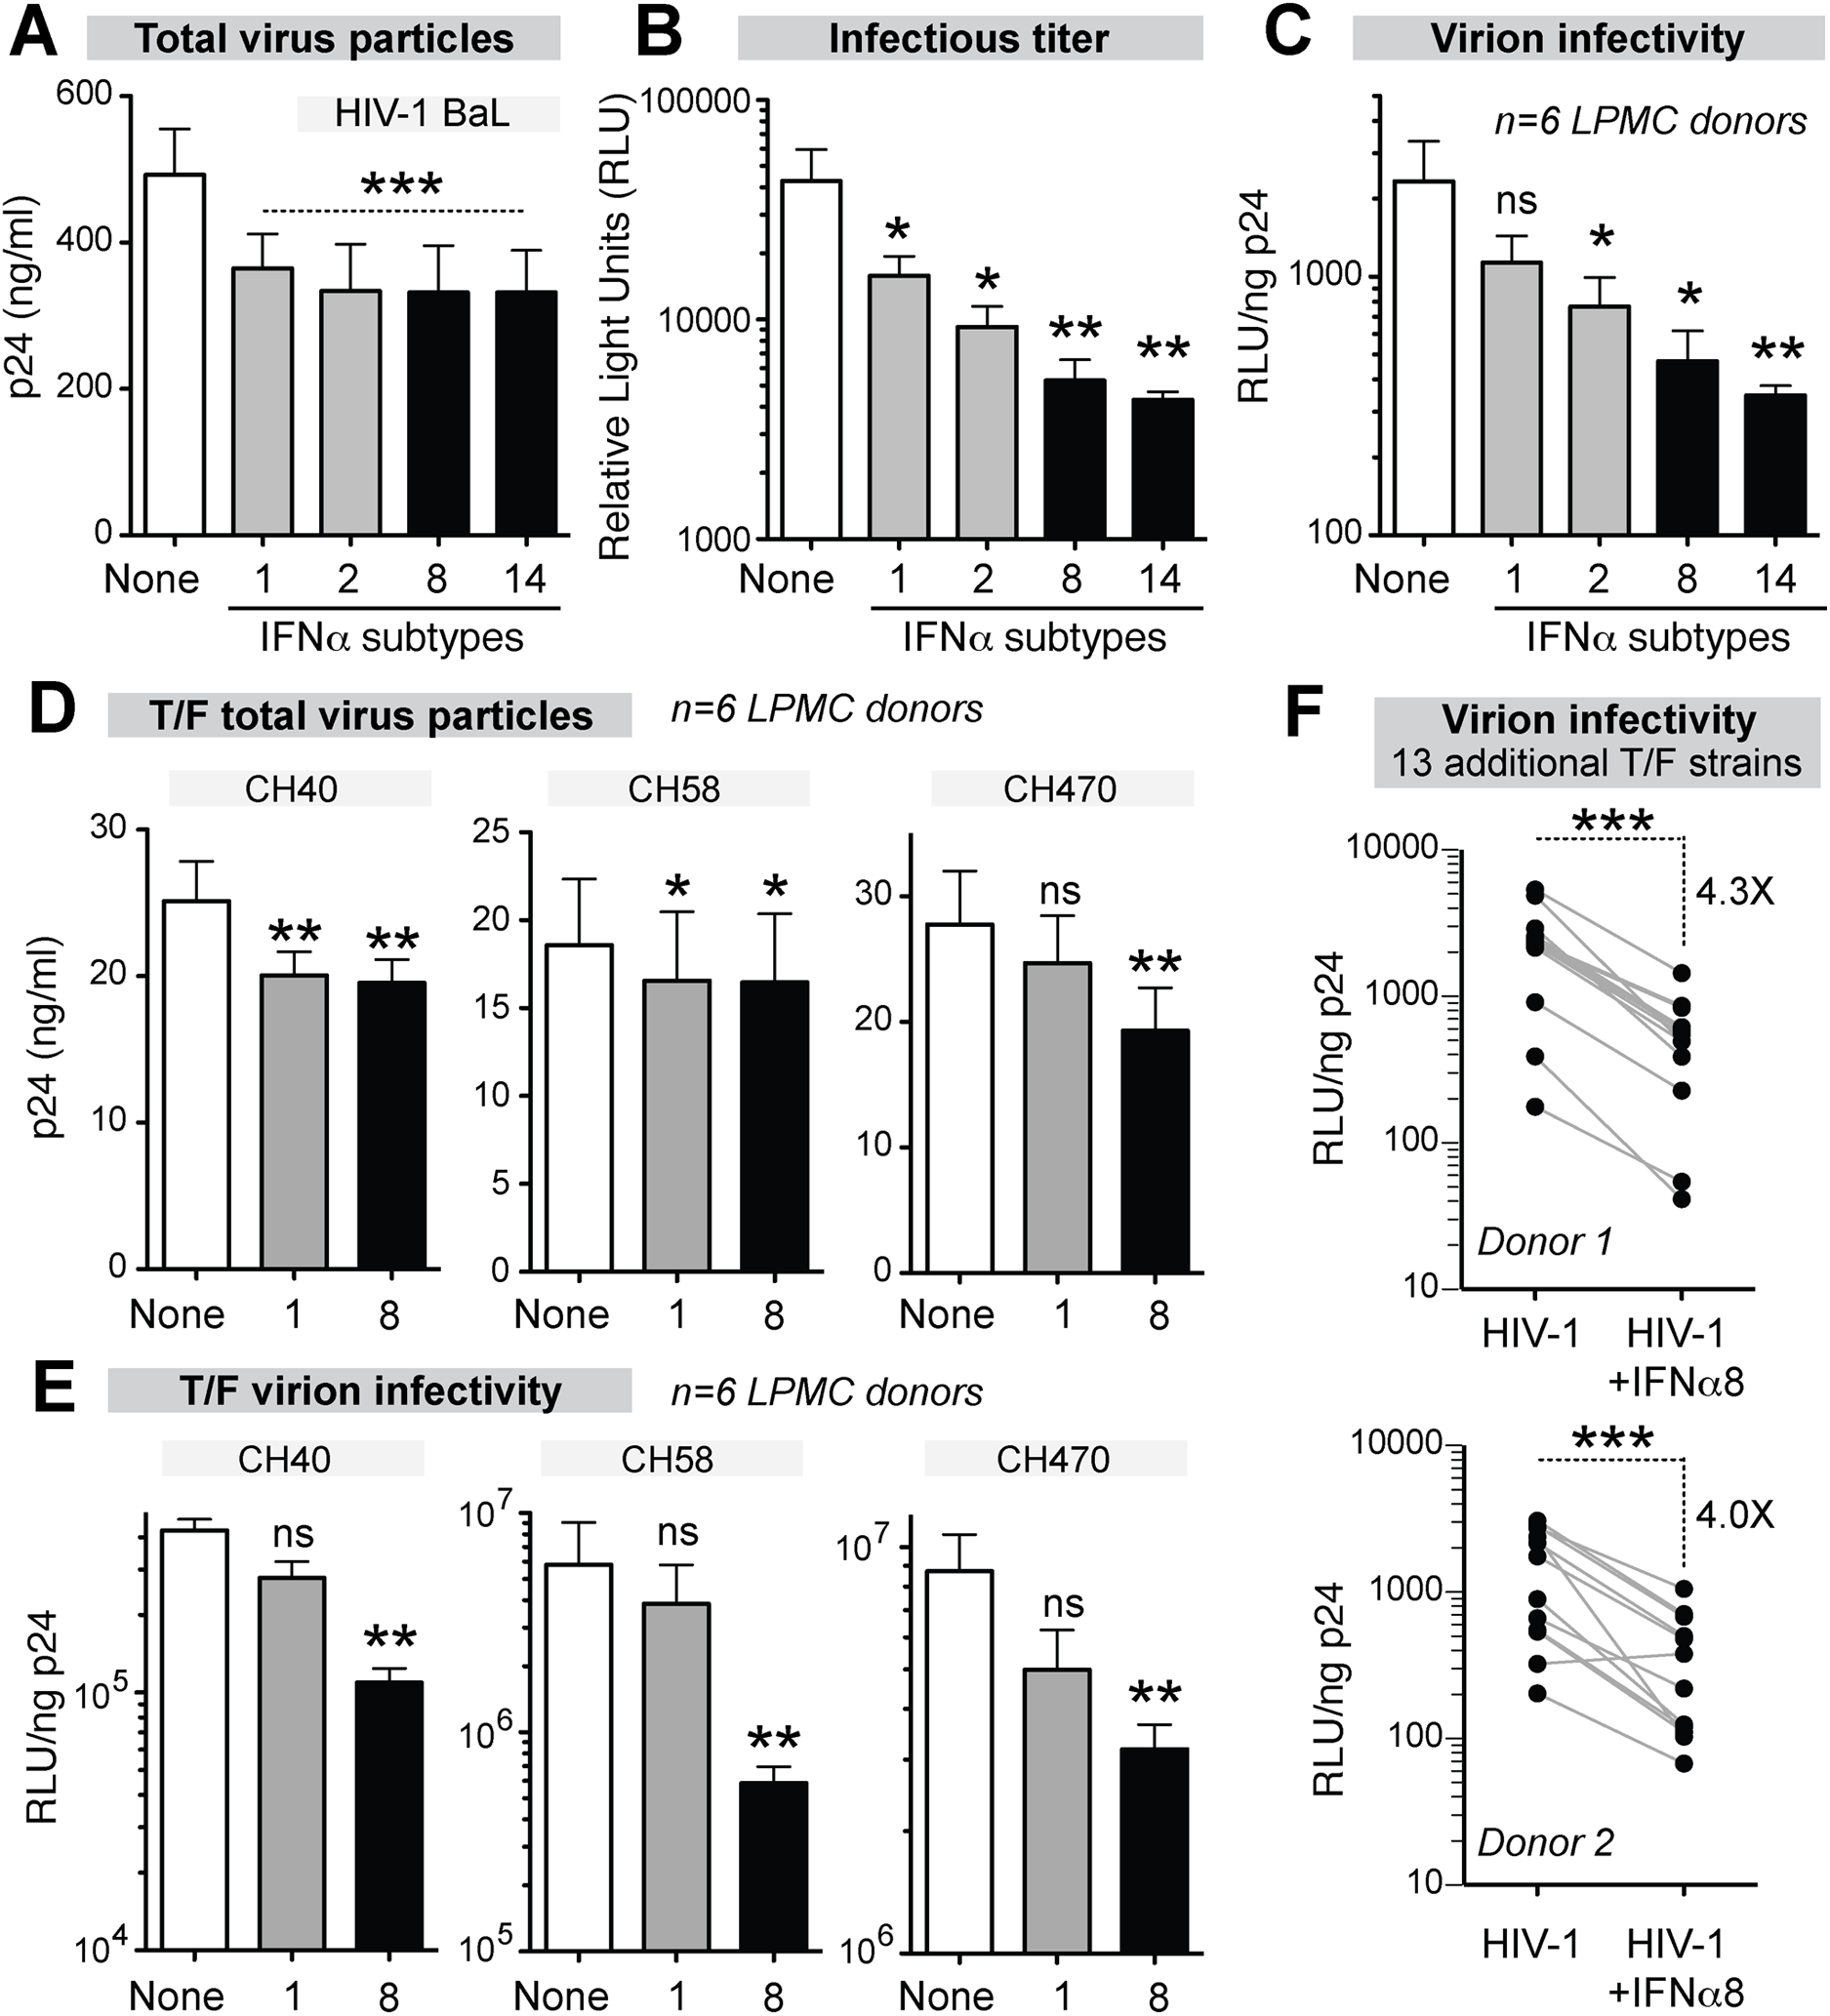 Potent IFNα subtypes inhibit HIV-1 virion infectivity.